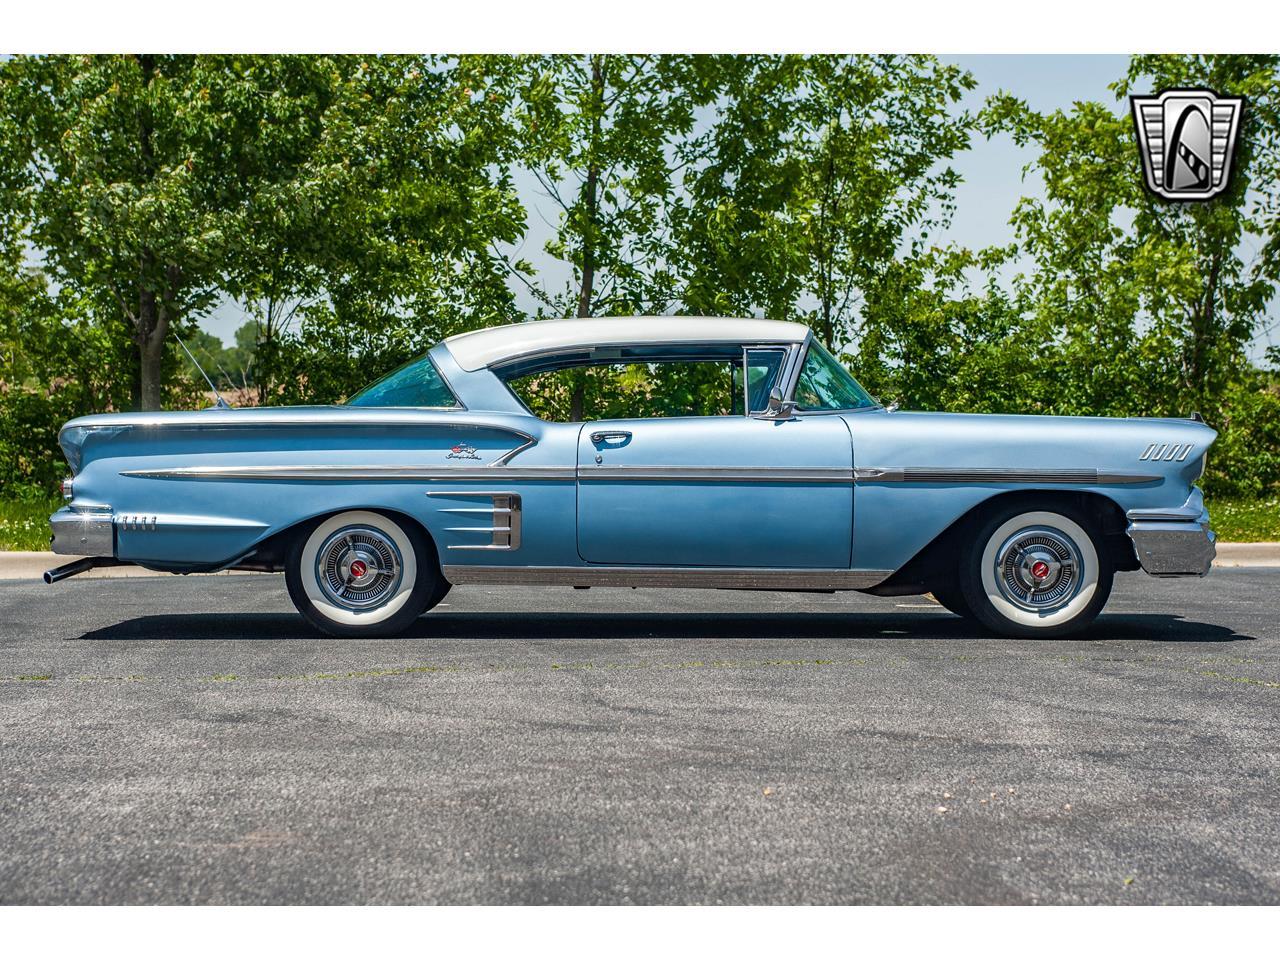 Large Picture of Classic 1958 Chevrolet Impala located in O'Fallon Illinois - QB9Q